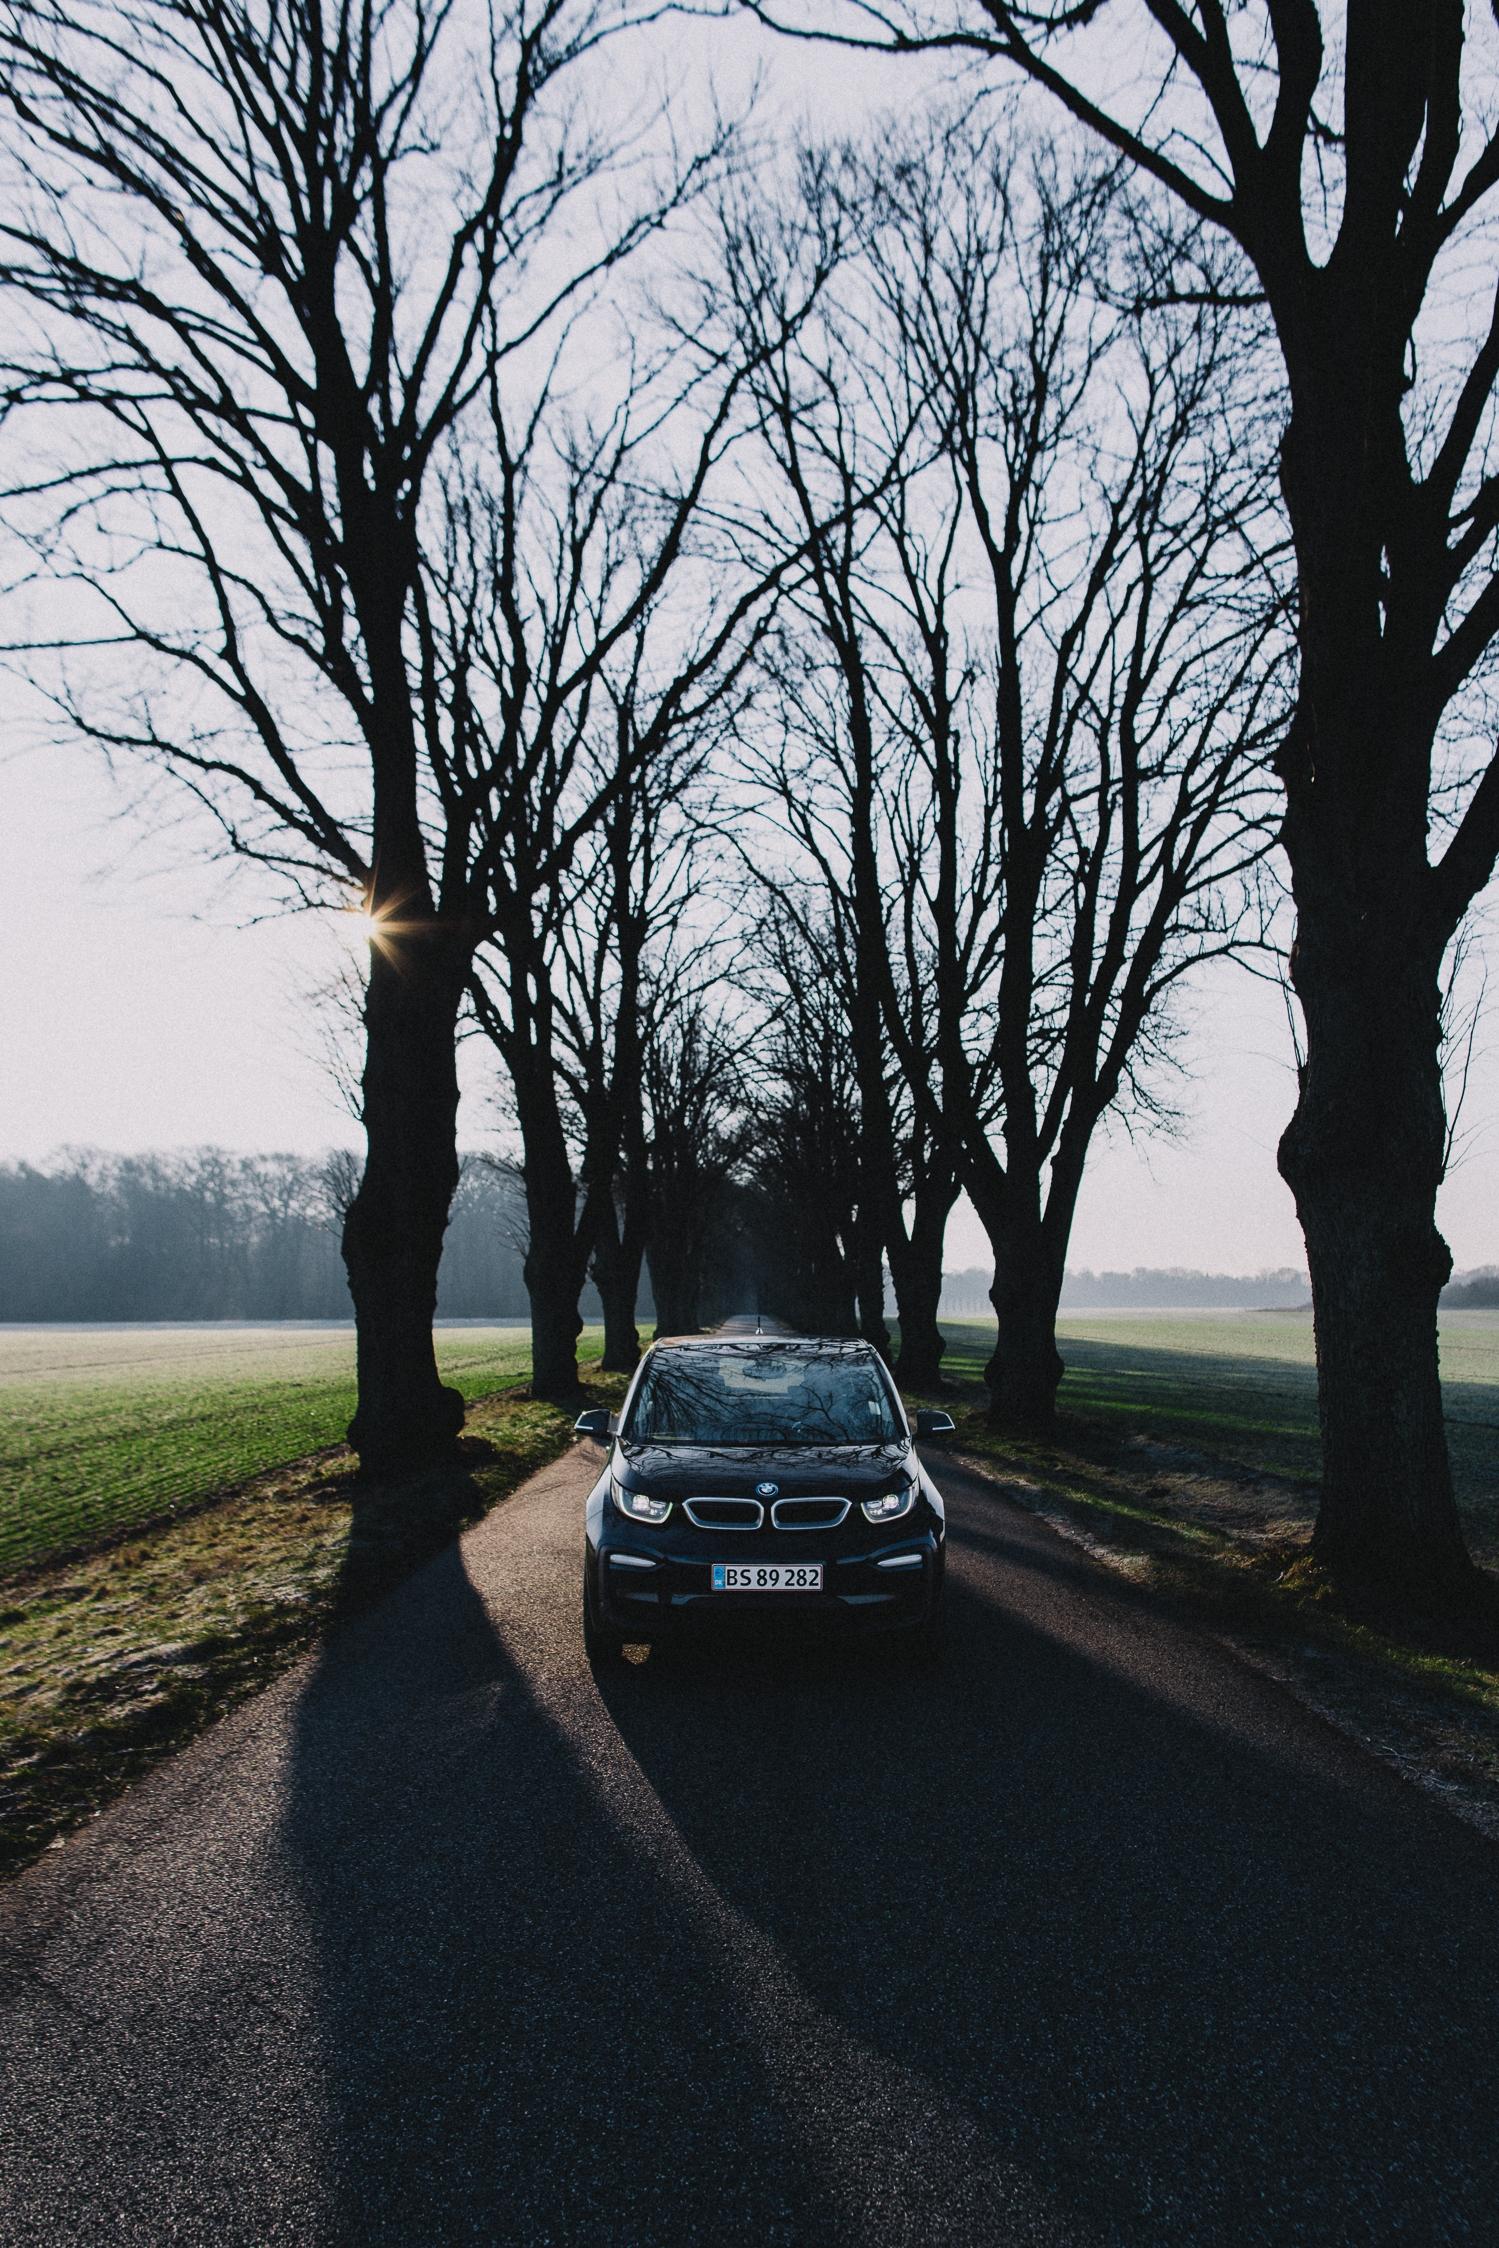 BMW x Morten Nordstrøm 00013.JPG